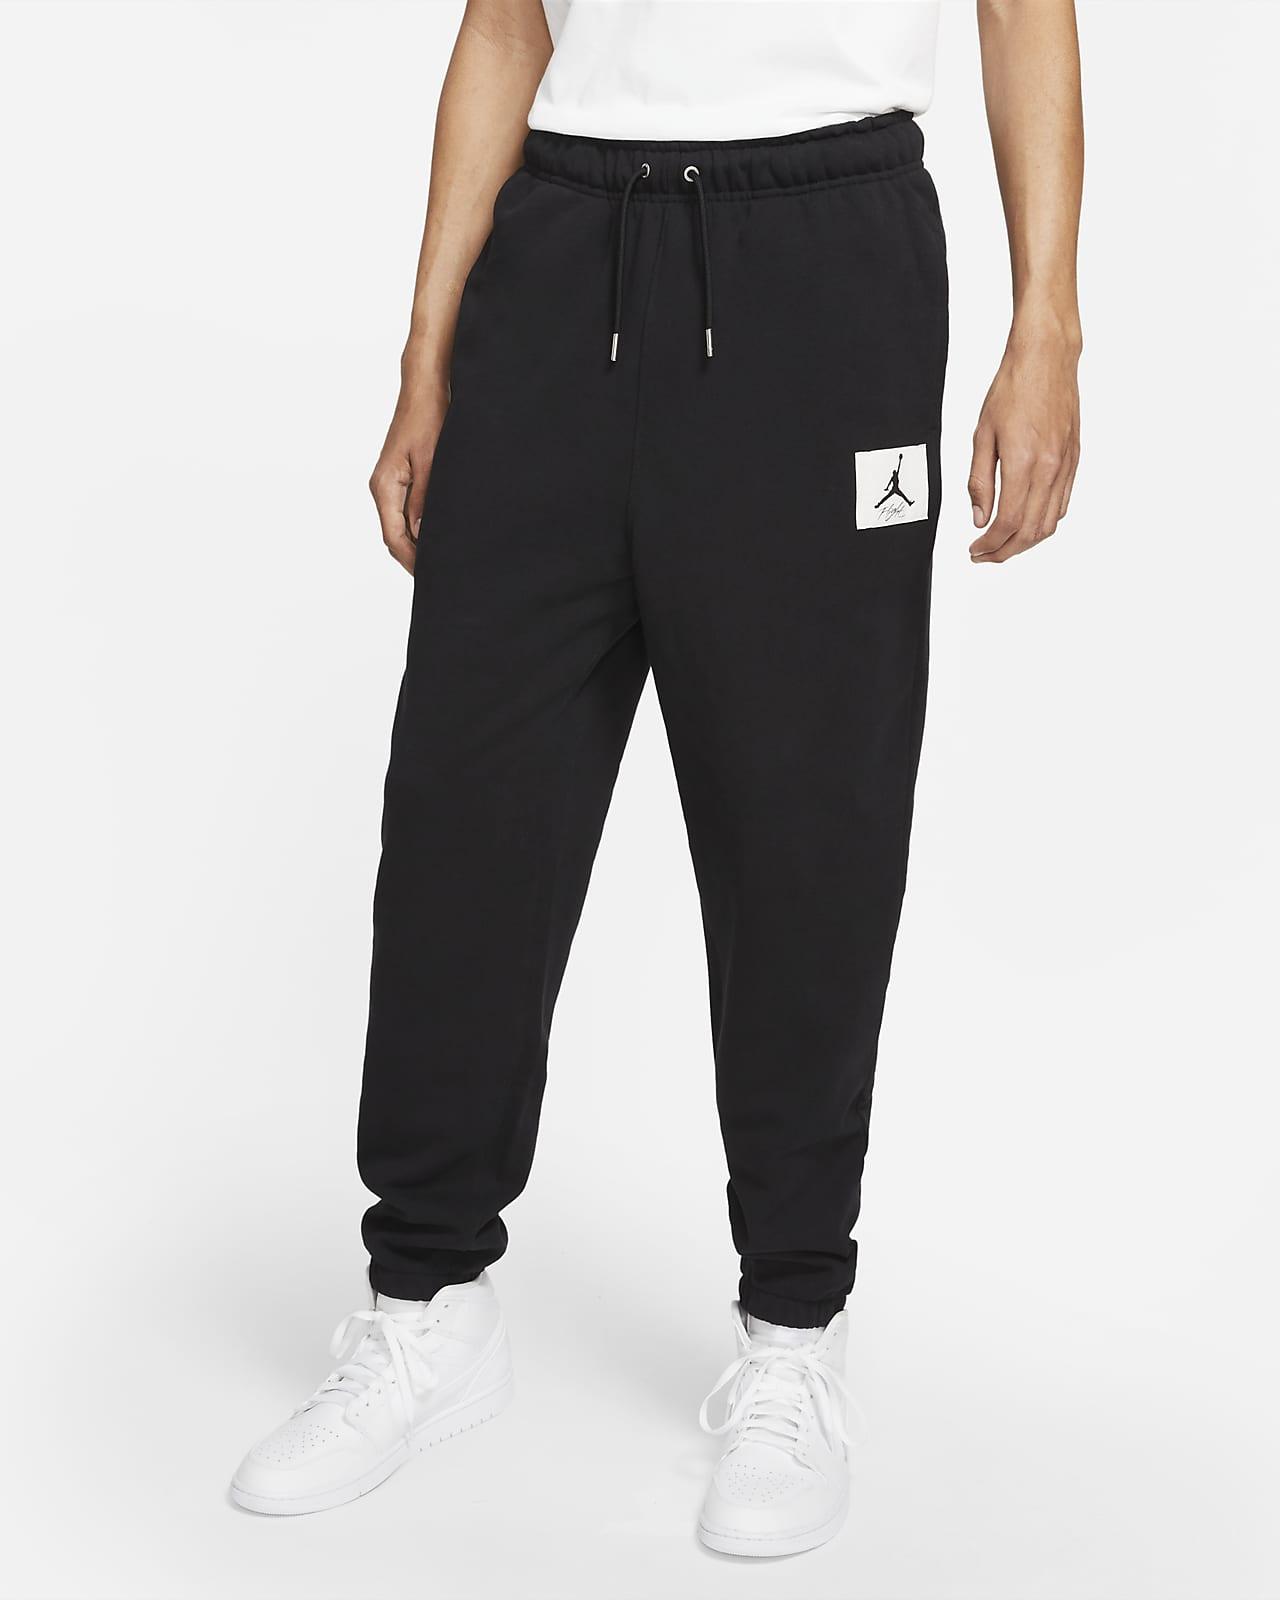 Jordan Essentials Pantalón de tejido Fleece - Hombre